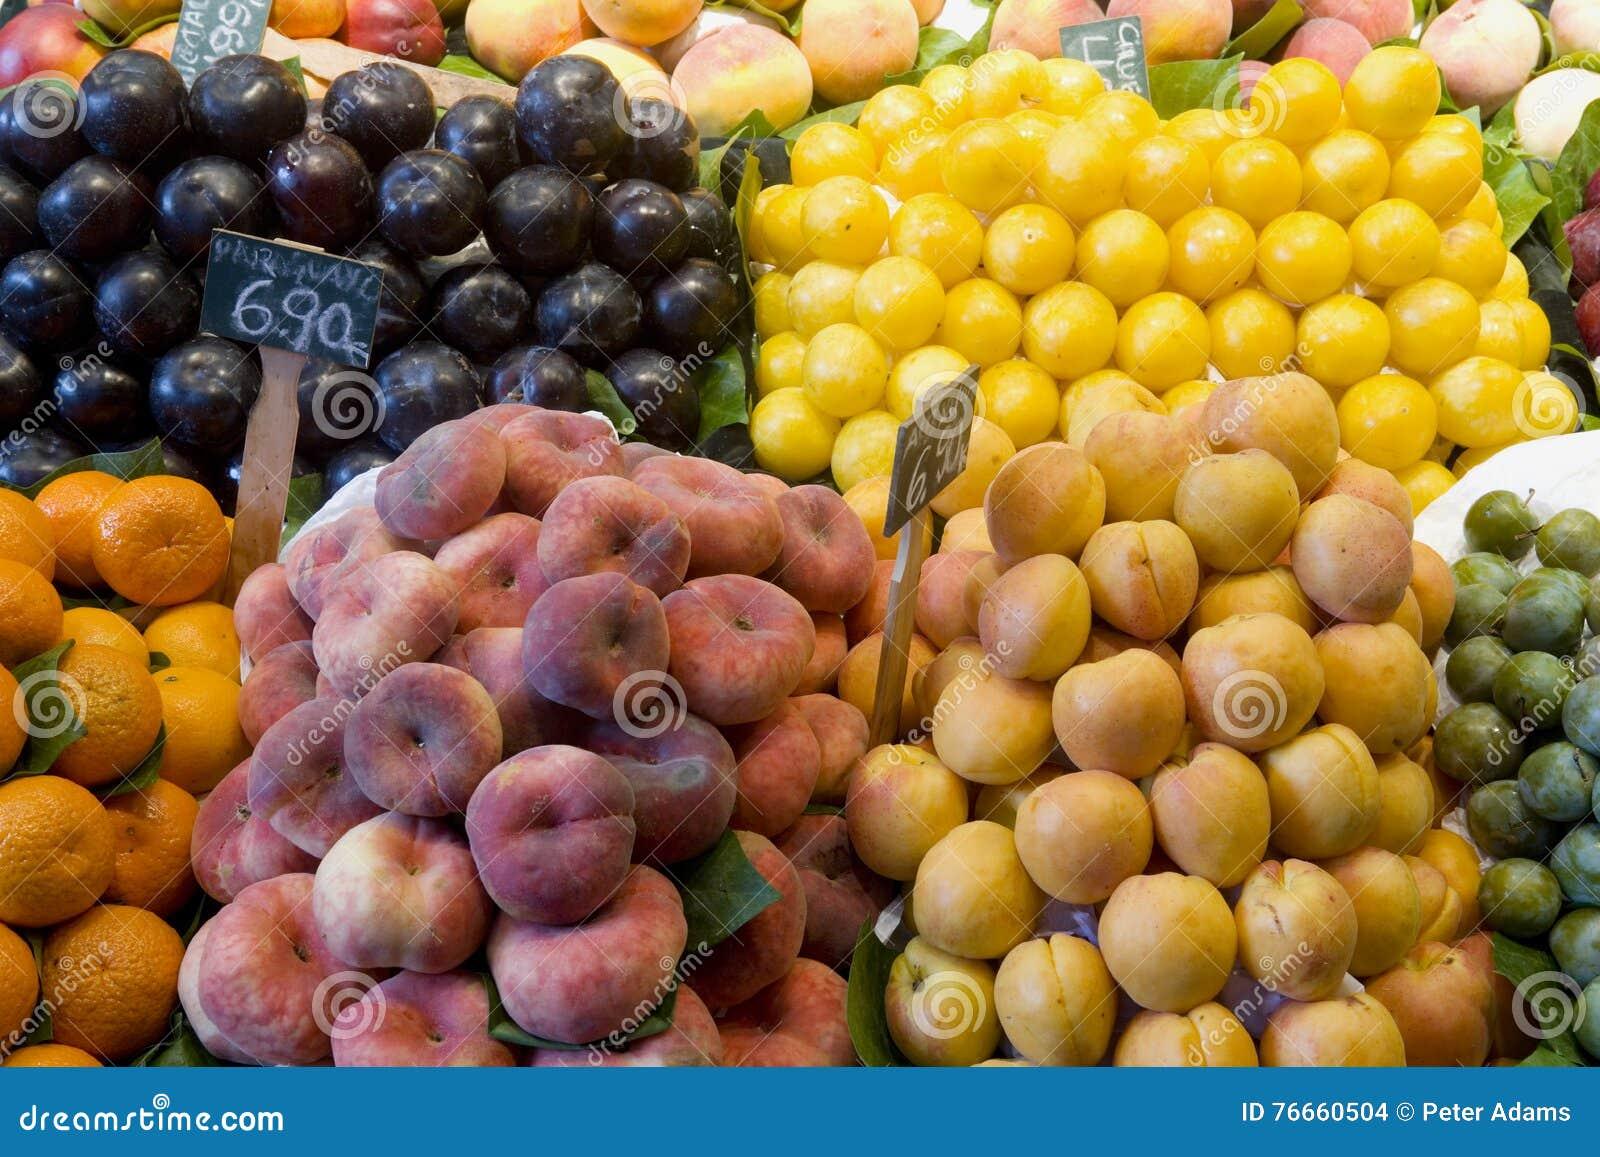 Плодоовощ для продажи на стойле рынка